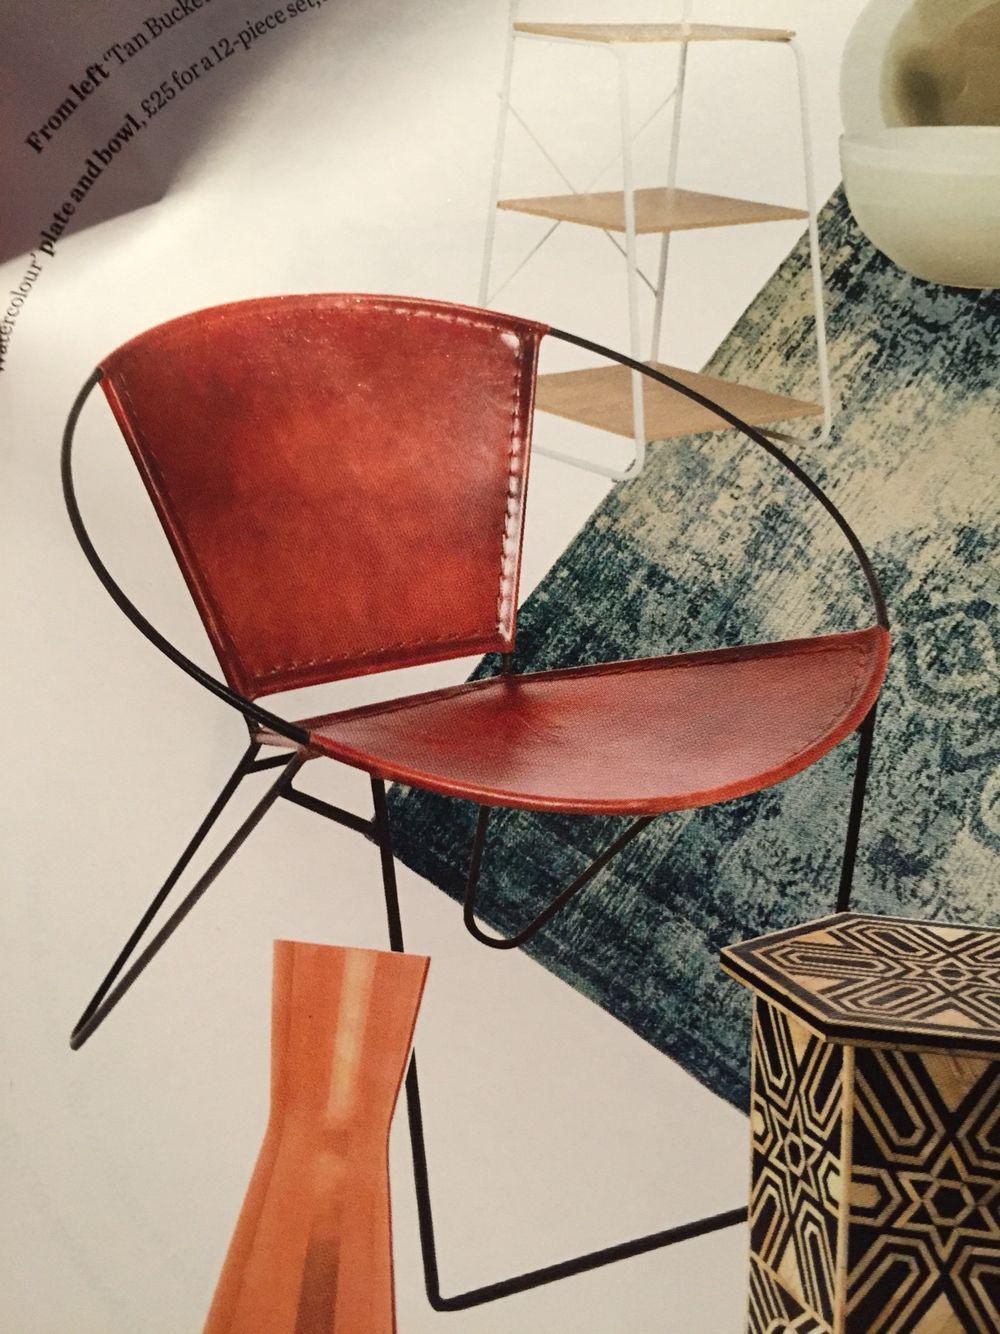 u0027Tan bucketu0027 leather chair £299 bhs.co.uk & Tan bucketu0027 leather chair £299 bhs.co.uk   Outdoor furniture ...